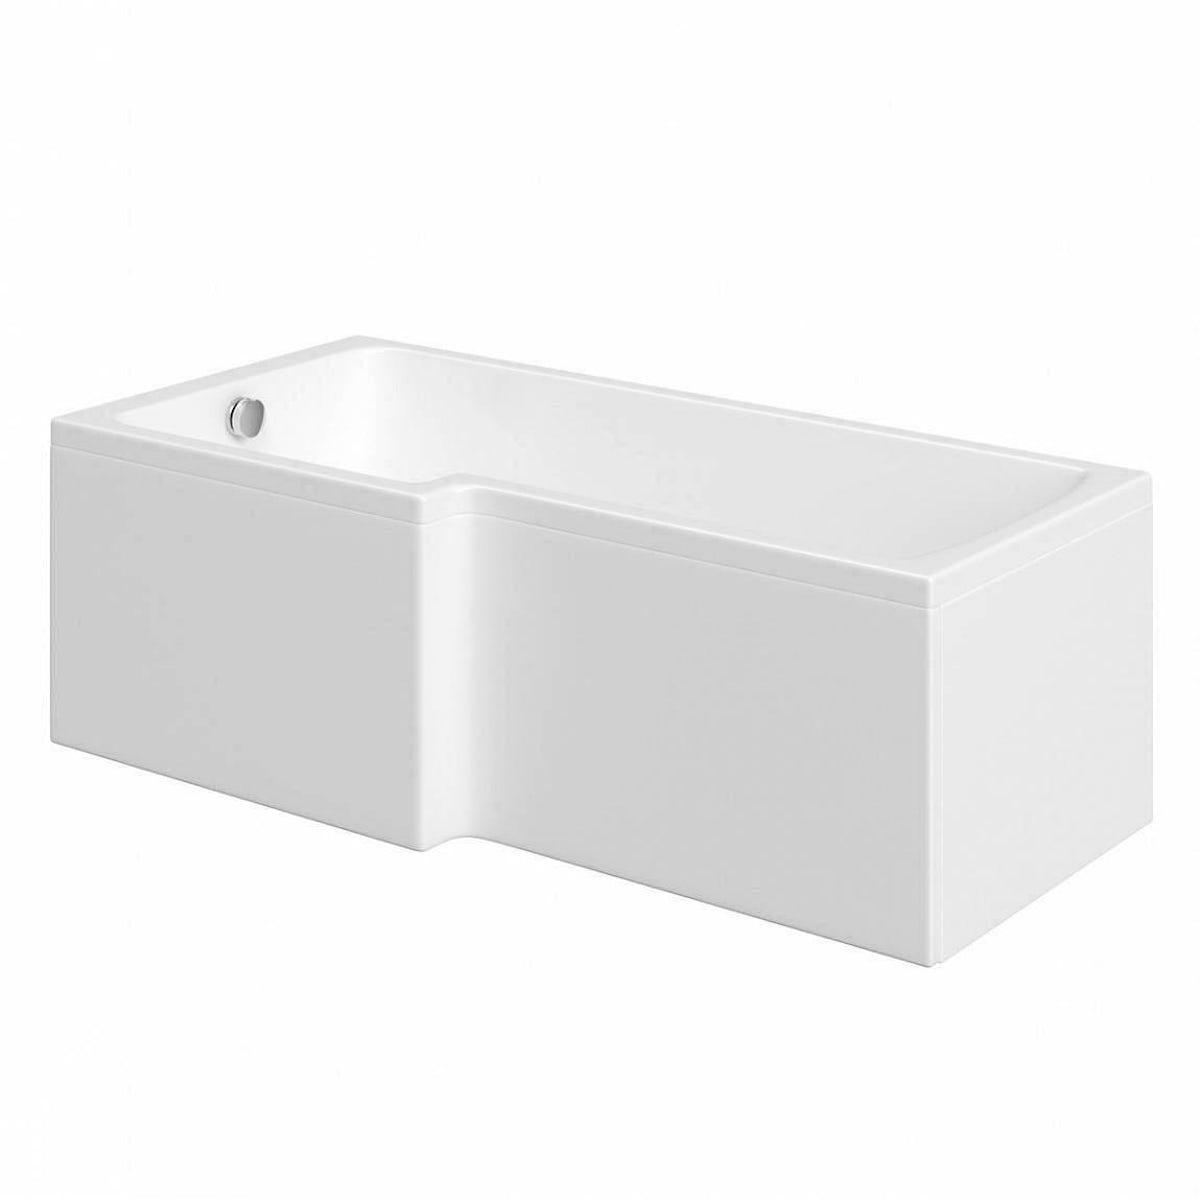 Boston Shower Bath 1500 X 850 LH